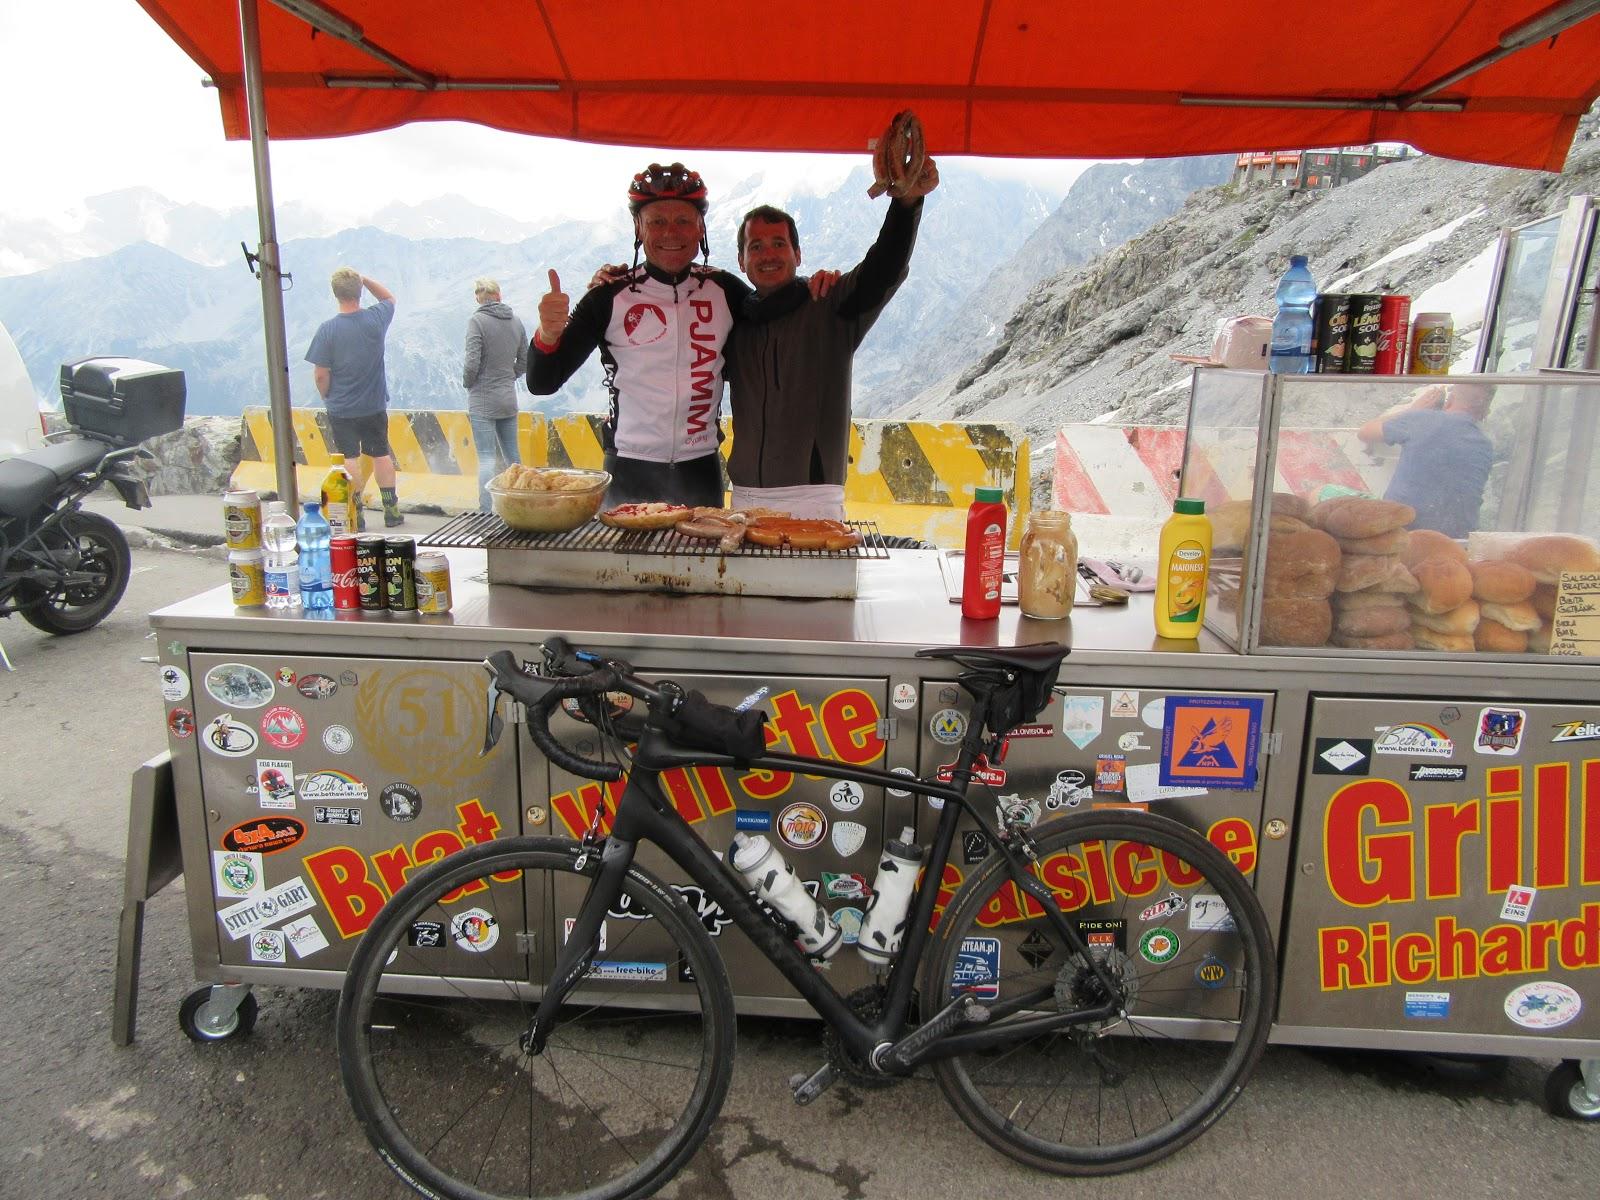 Bike climb Passo dello Stelvio - John Johnson PJAMM Cycling at Bratwurst and food cart with bike at top of climb